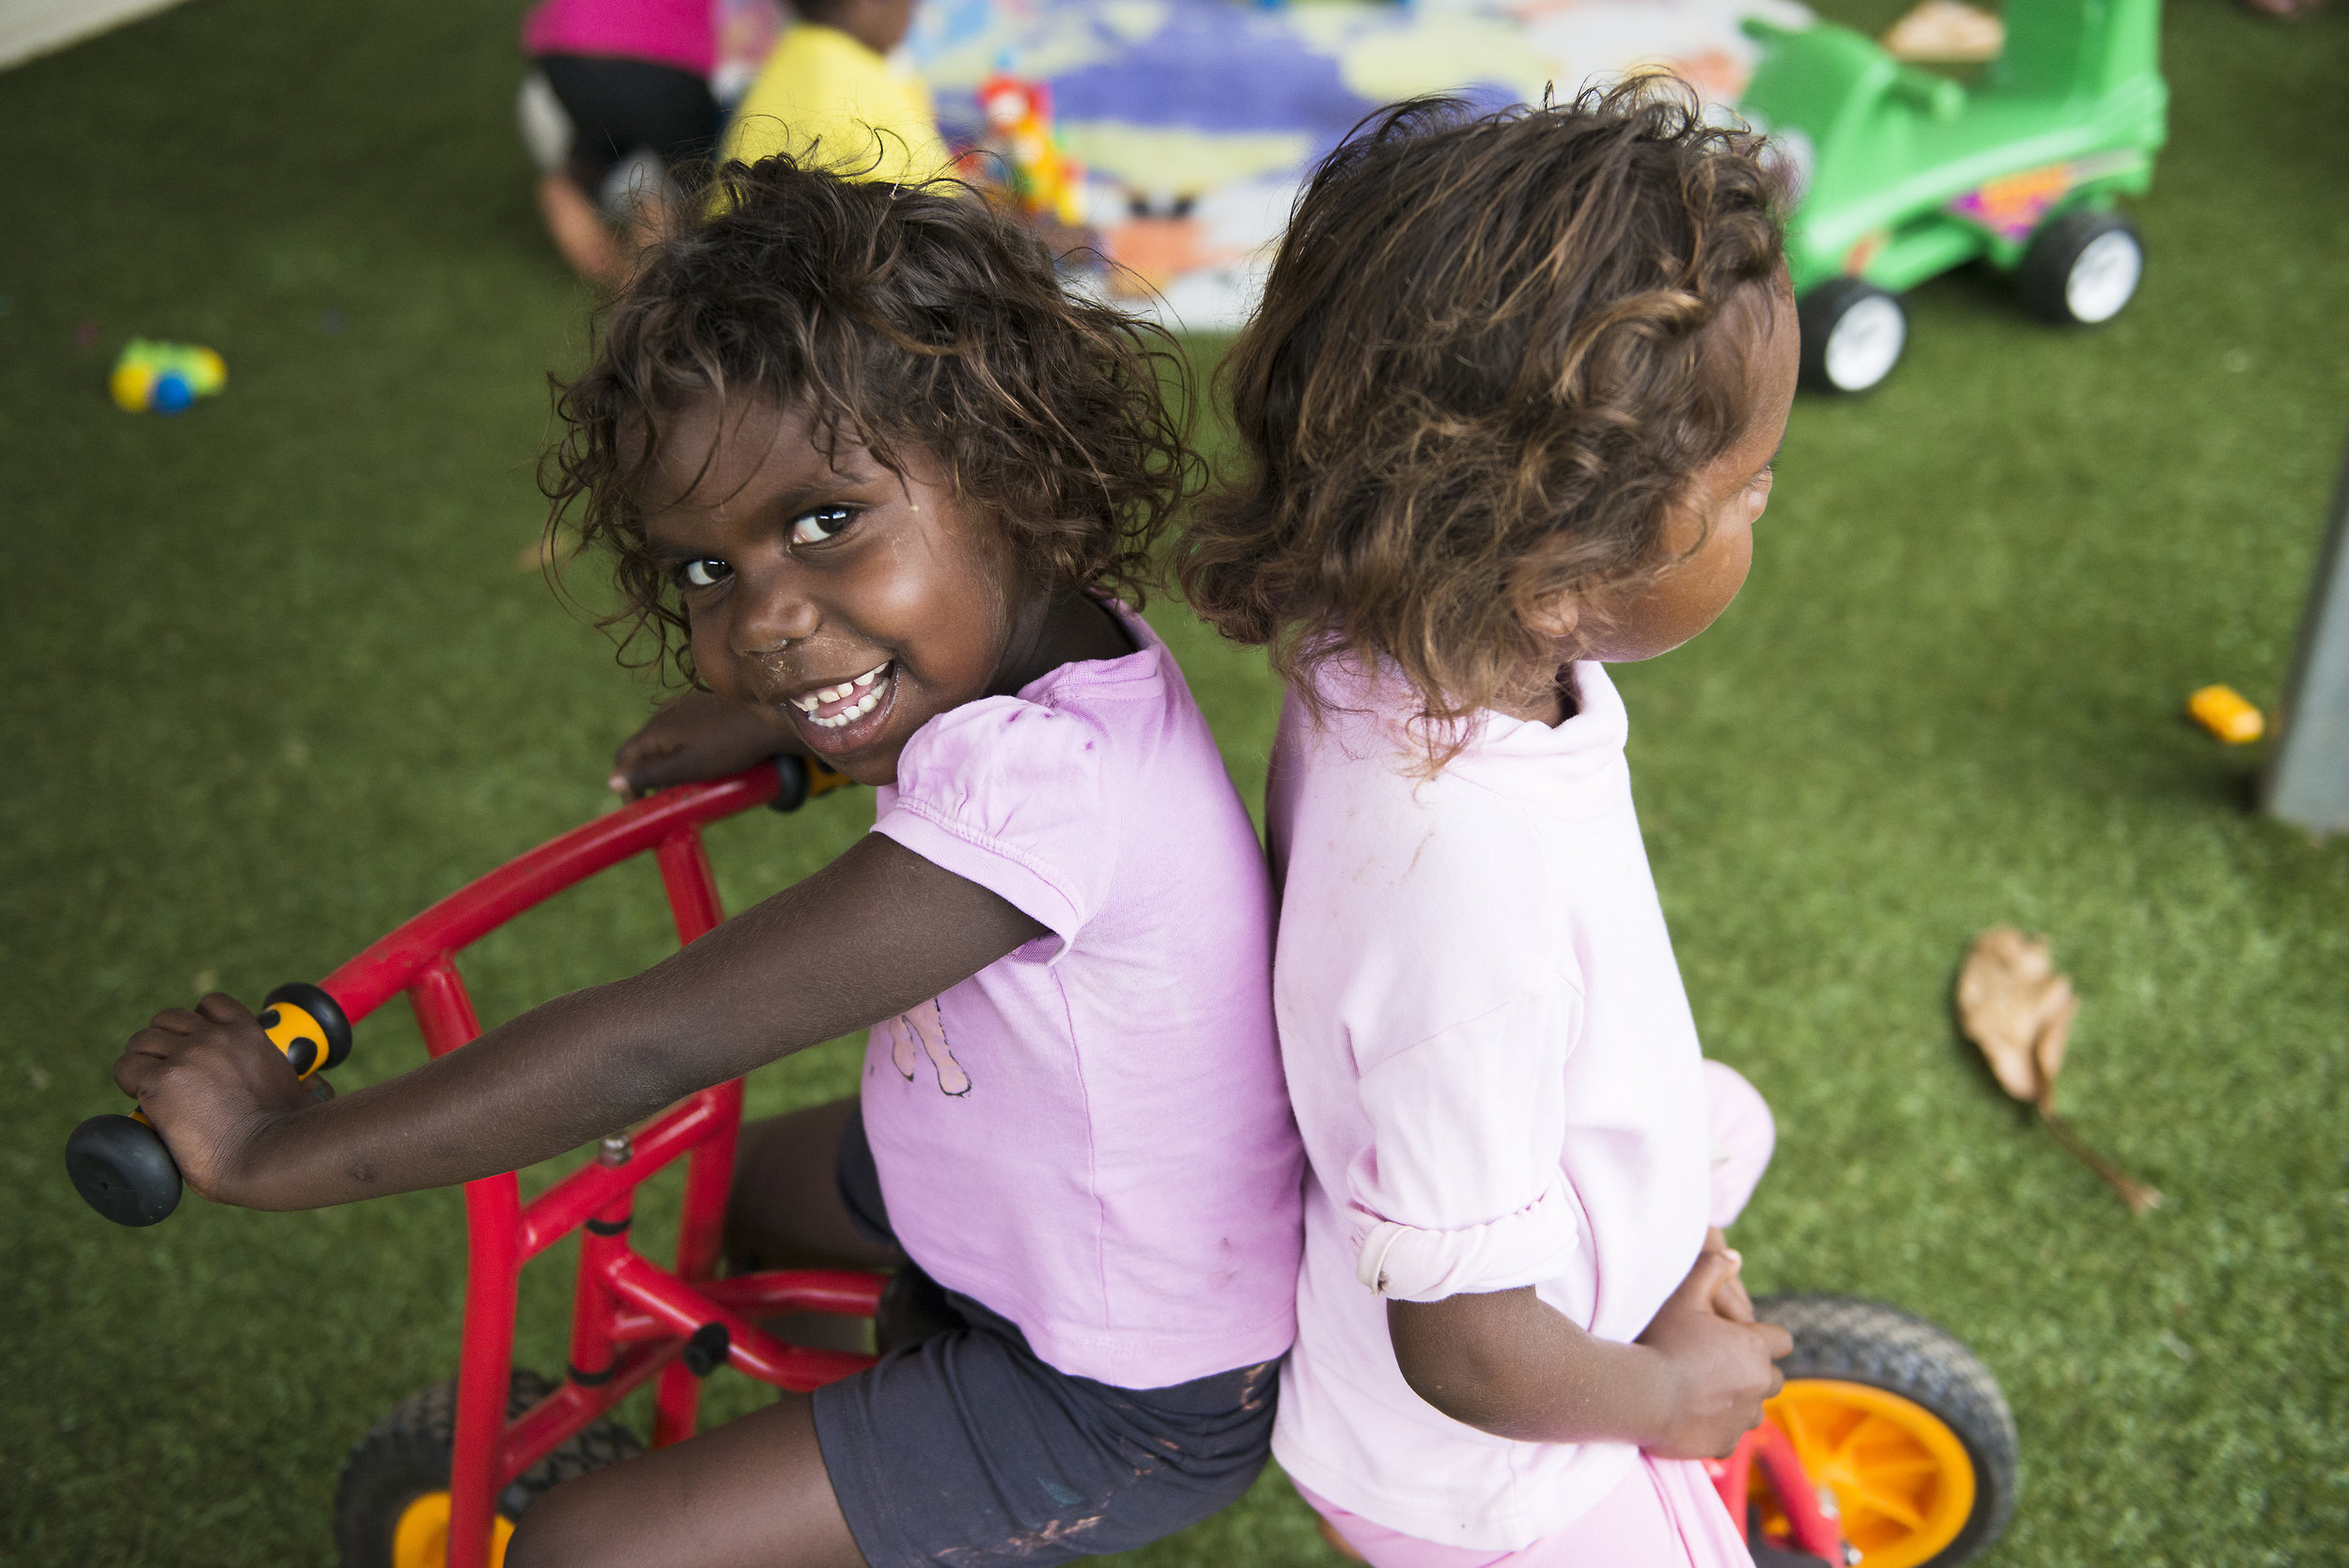 Early Childhood program. Mornington Island, Queensland. 2016.